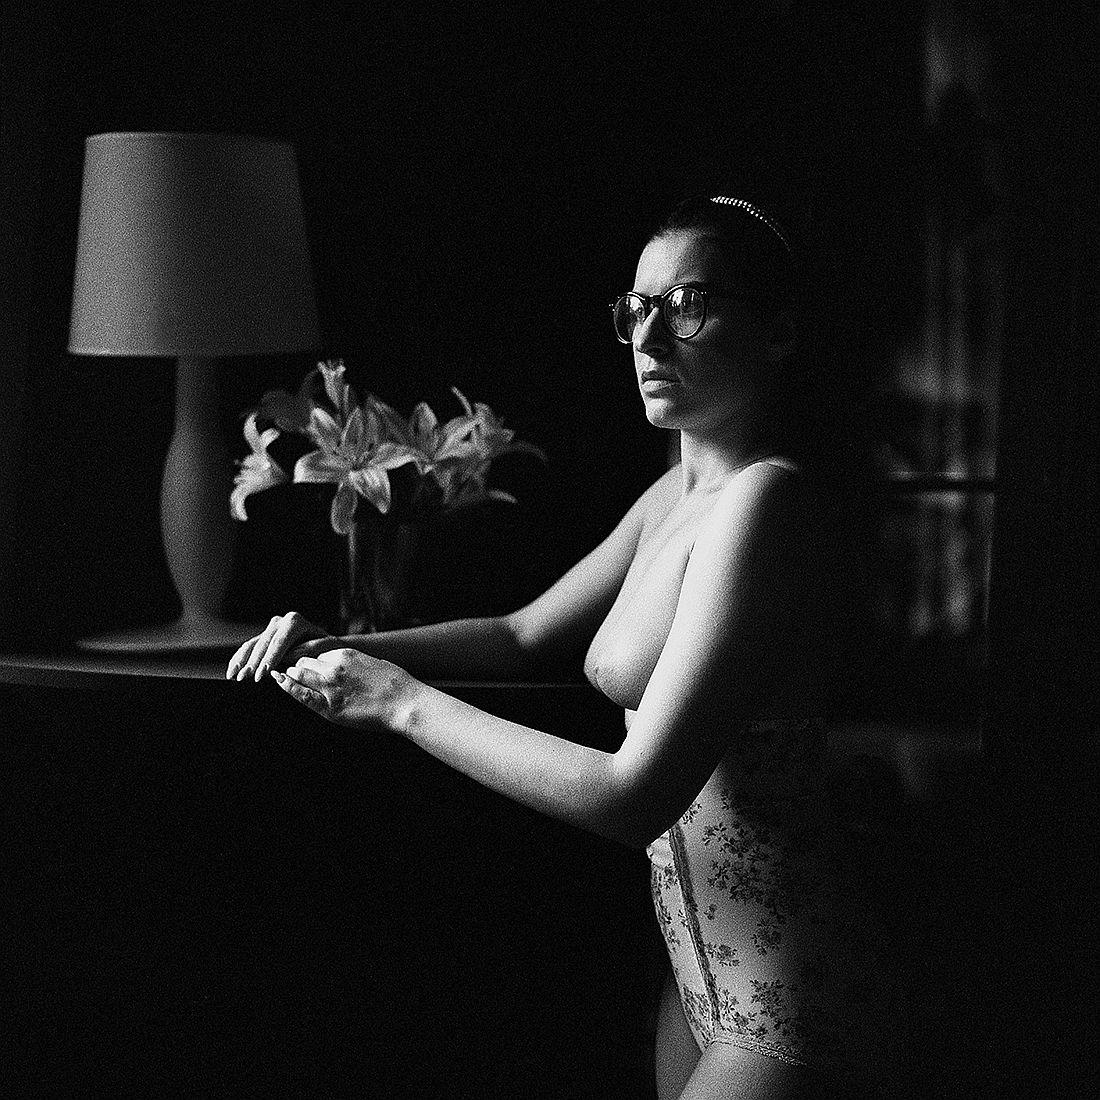 rafal-kazmierczak-nude-portrait-photographer-14